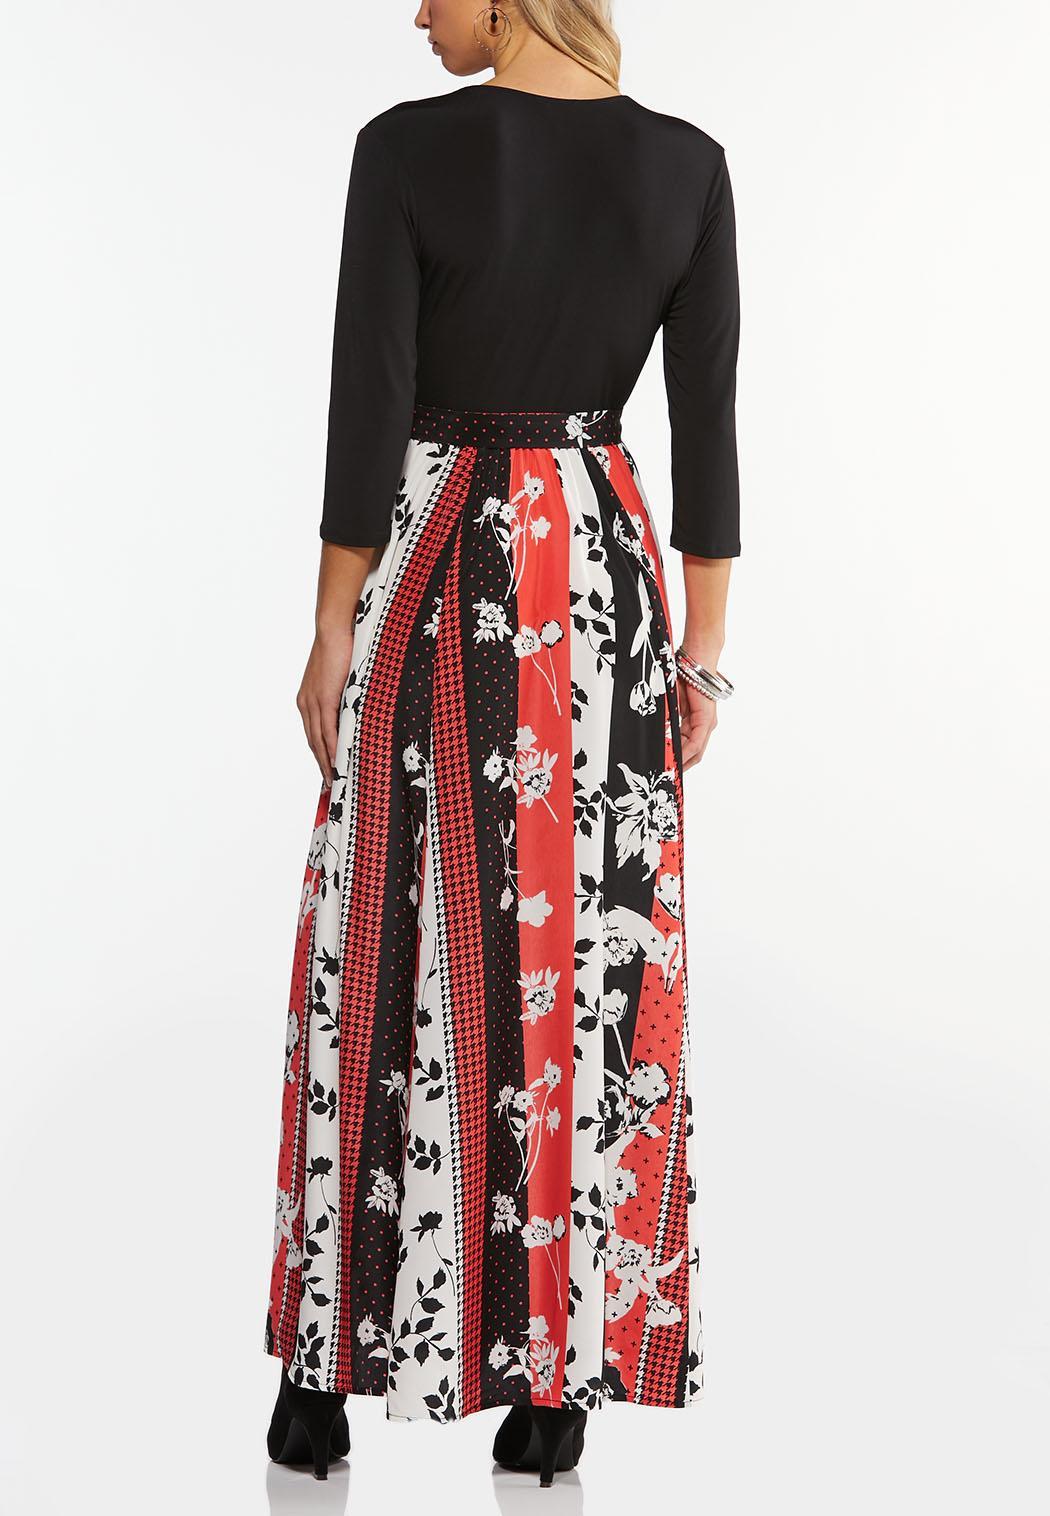 Petite Spice Floral Maxi Dress (Item #44466981)